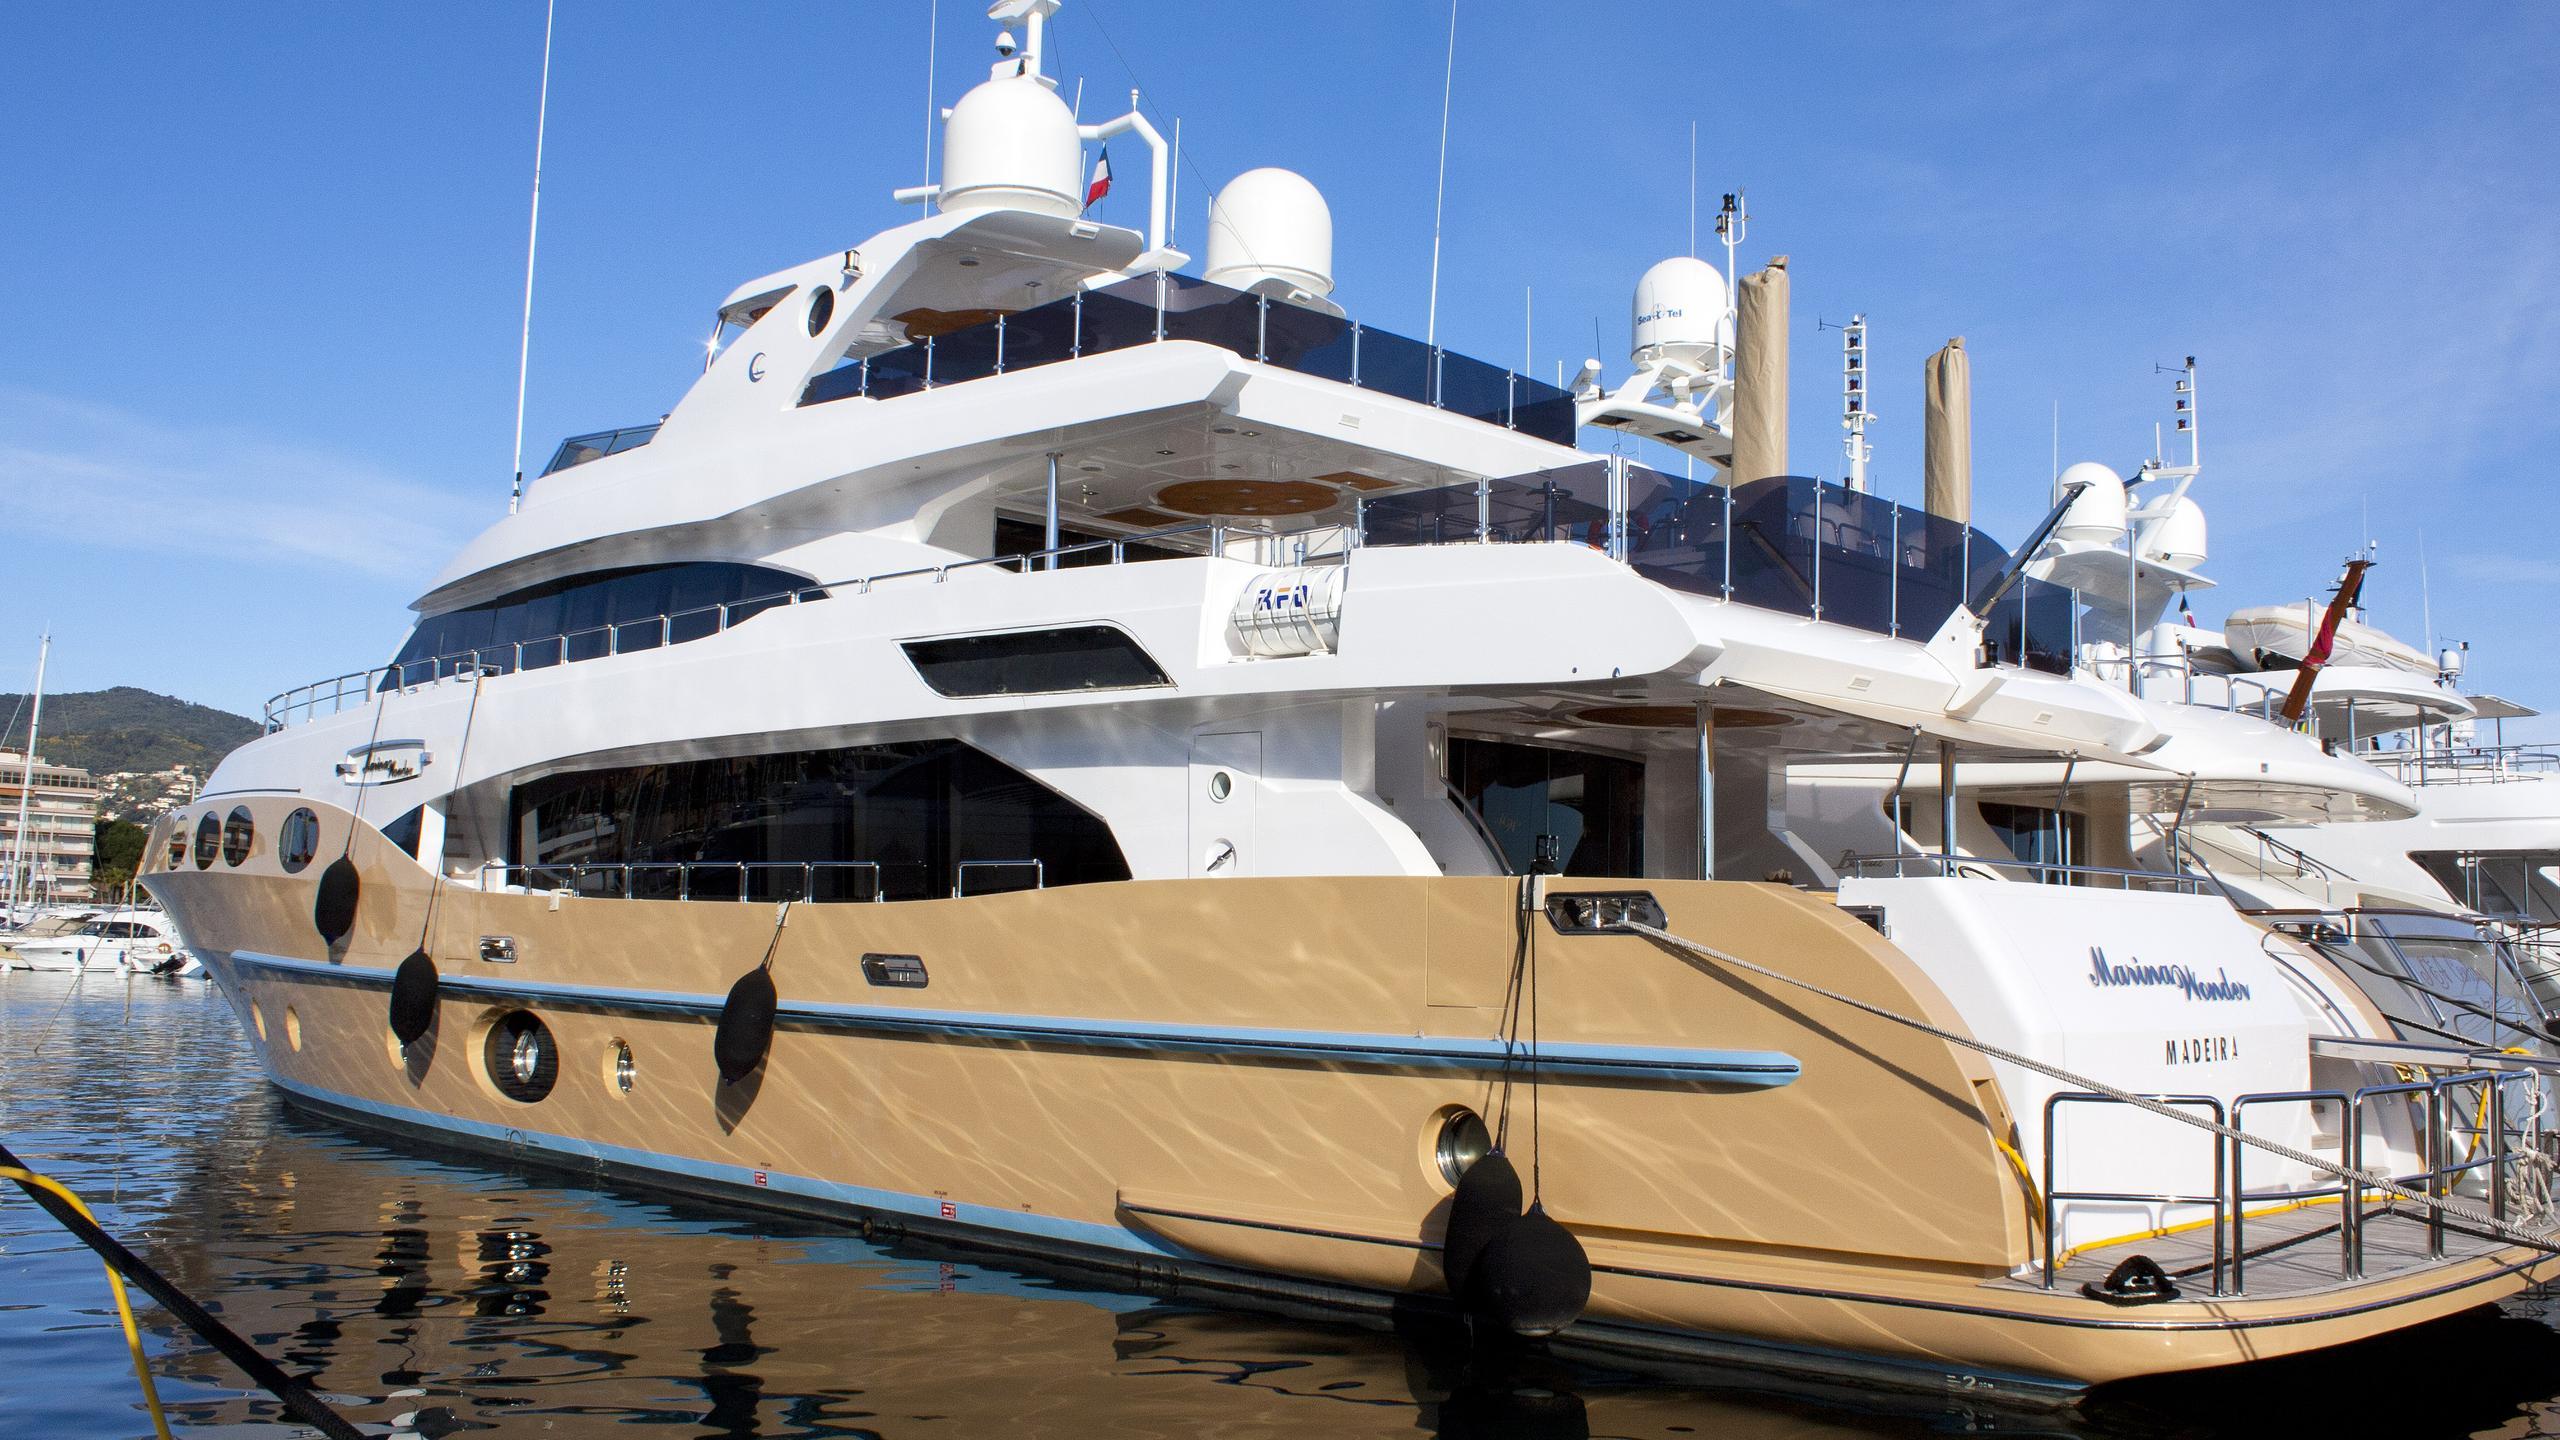 marina-wonder-motor-yacht-gulf-craft-2012-35m-half-profile